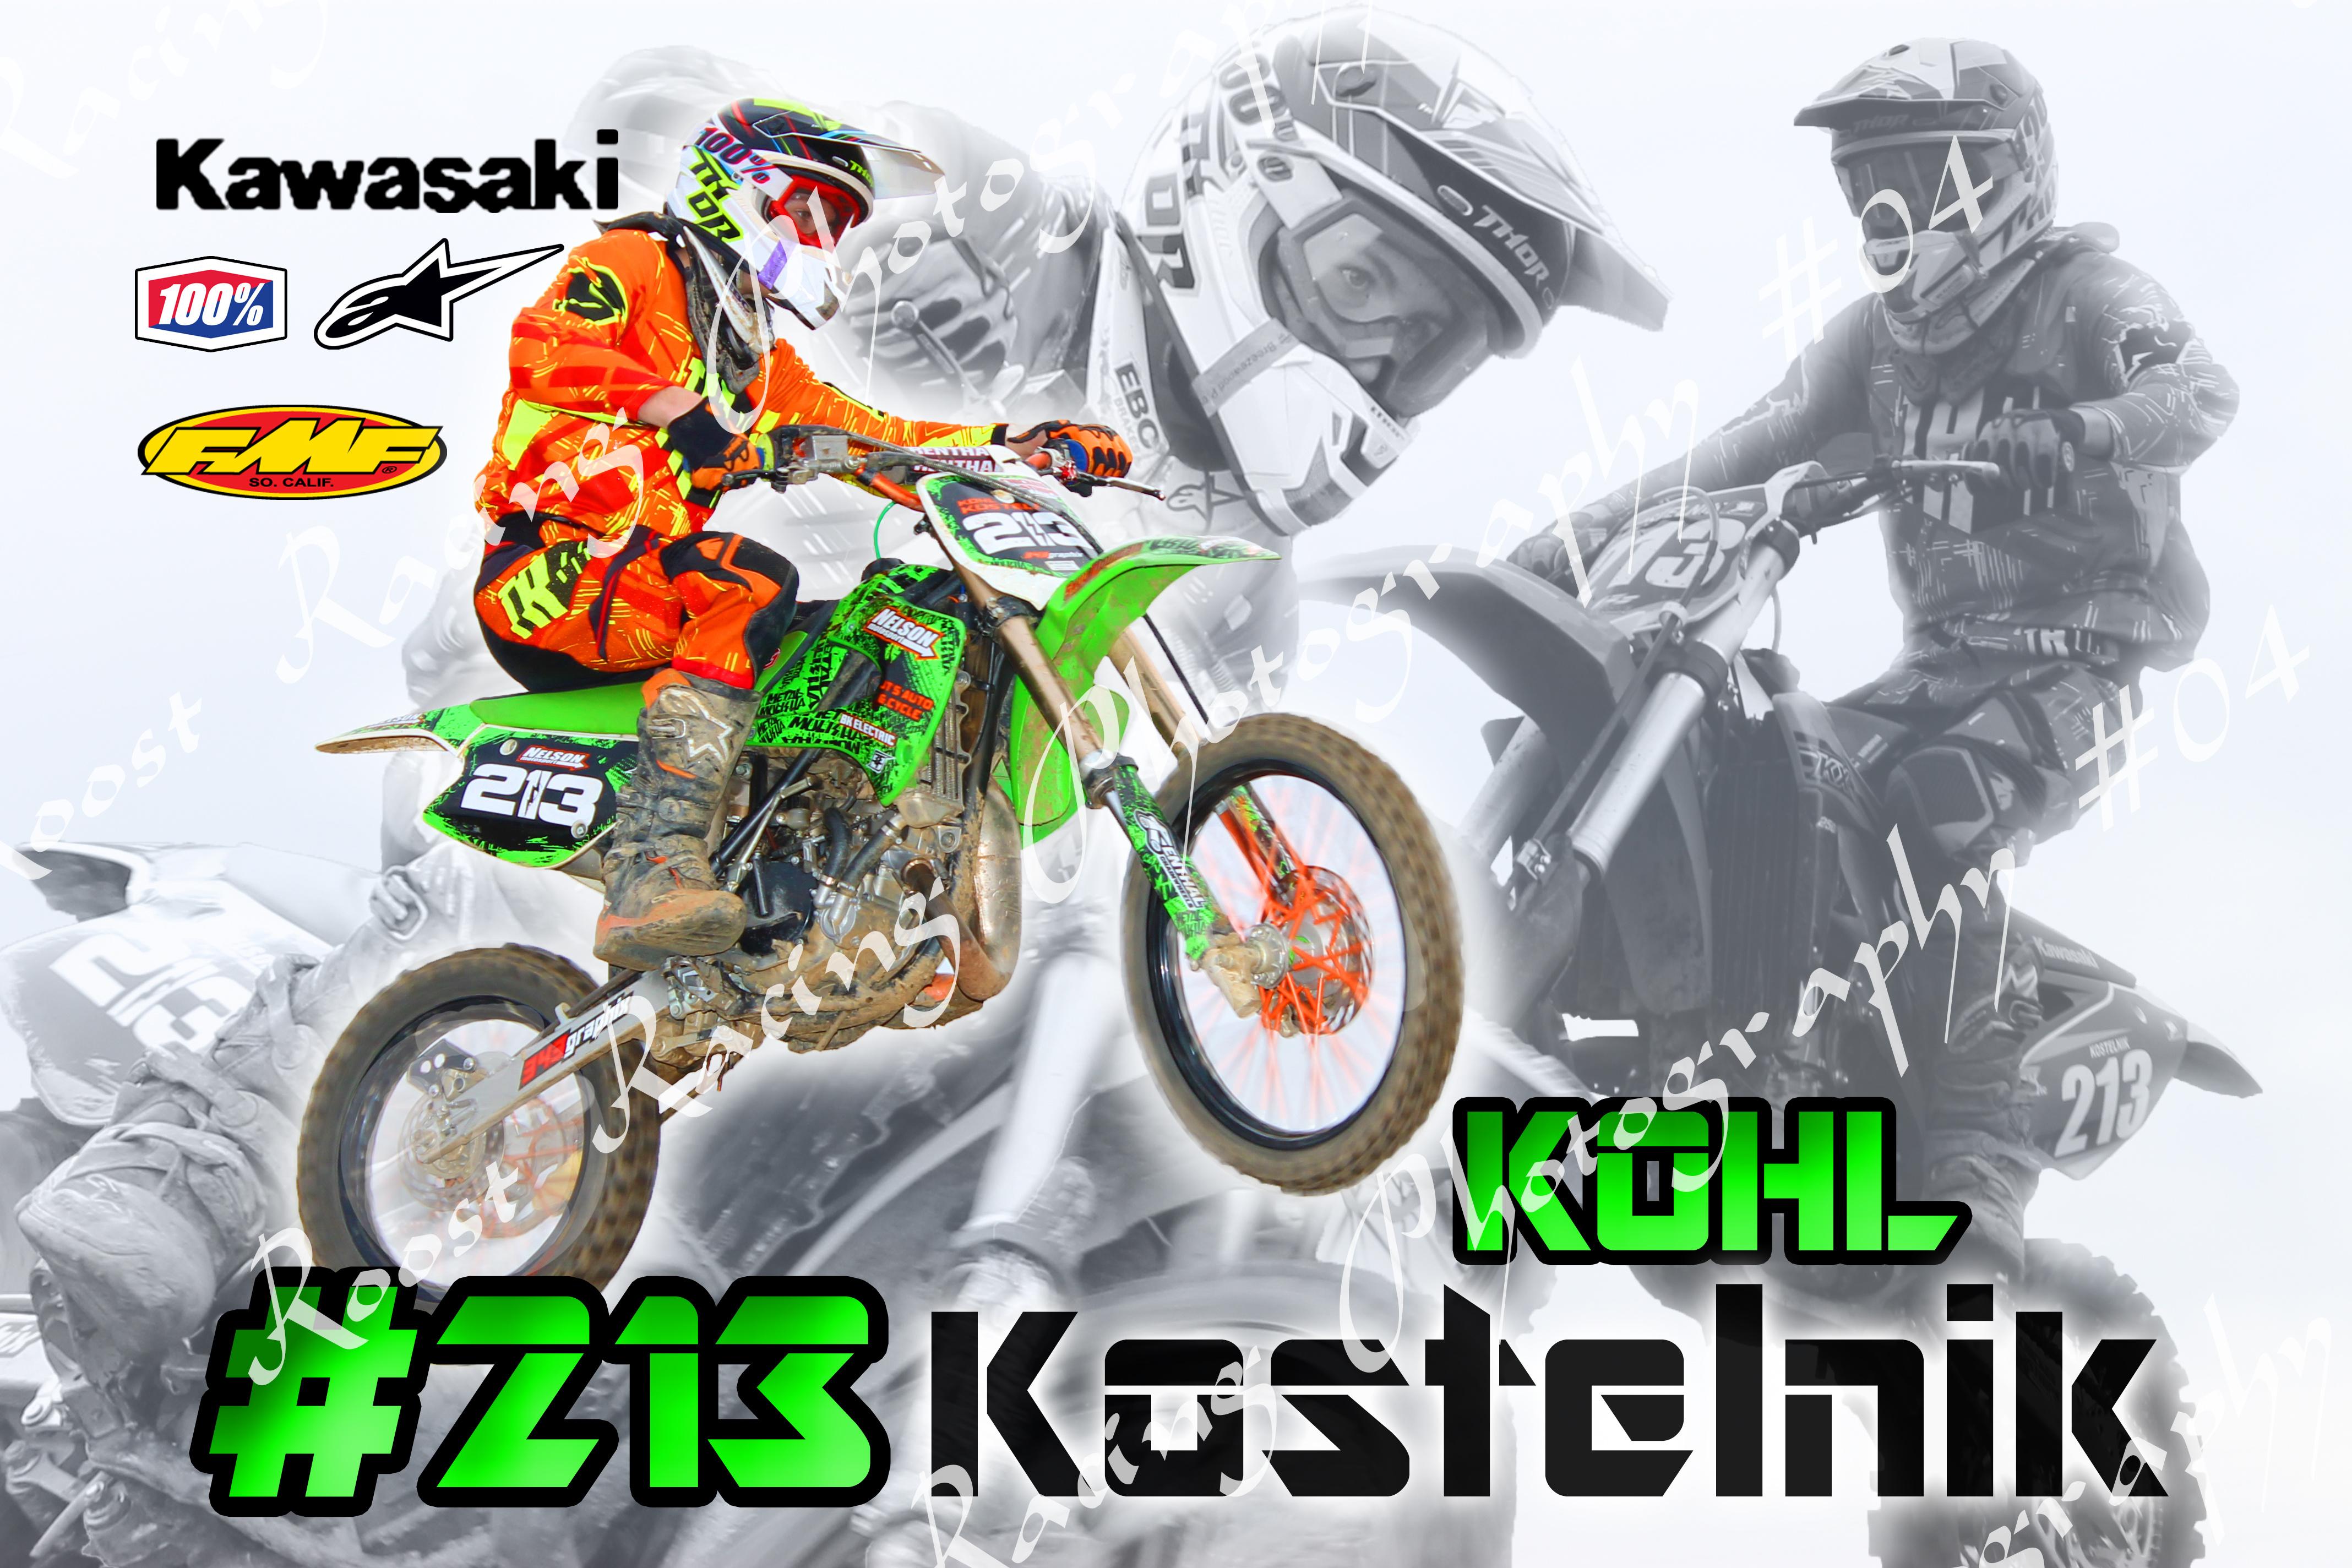 #213 Kohl Kostelink